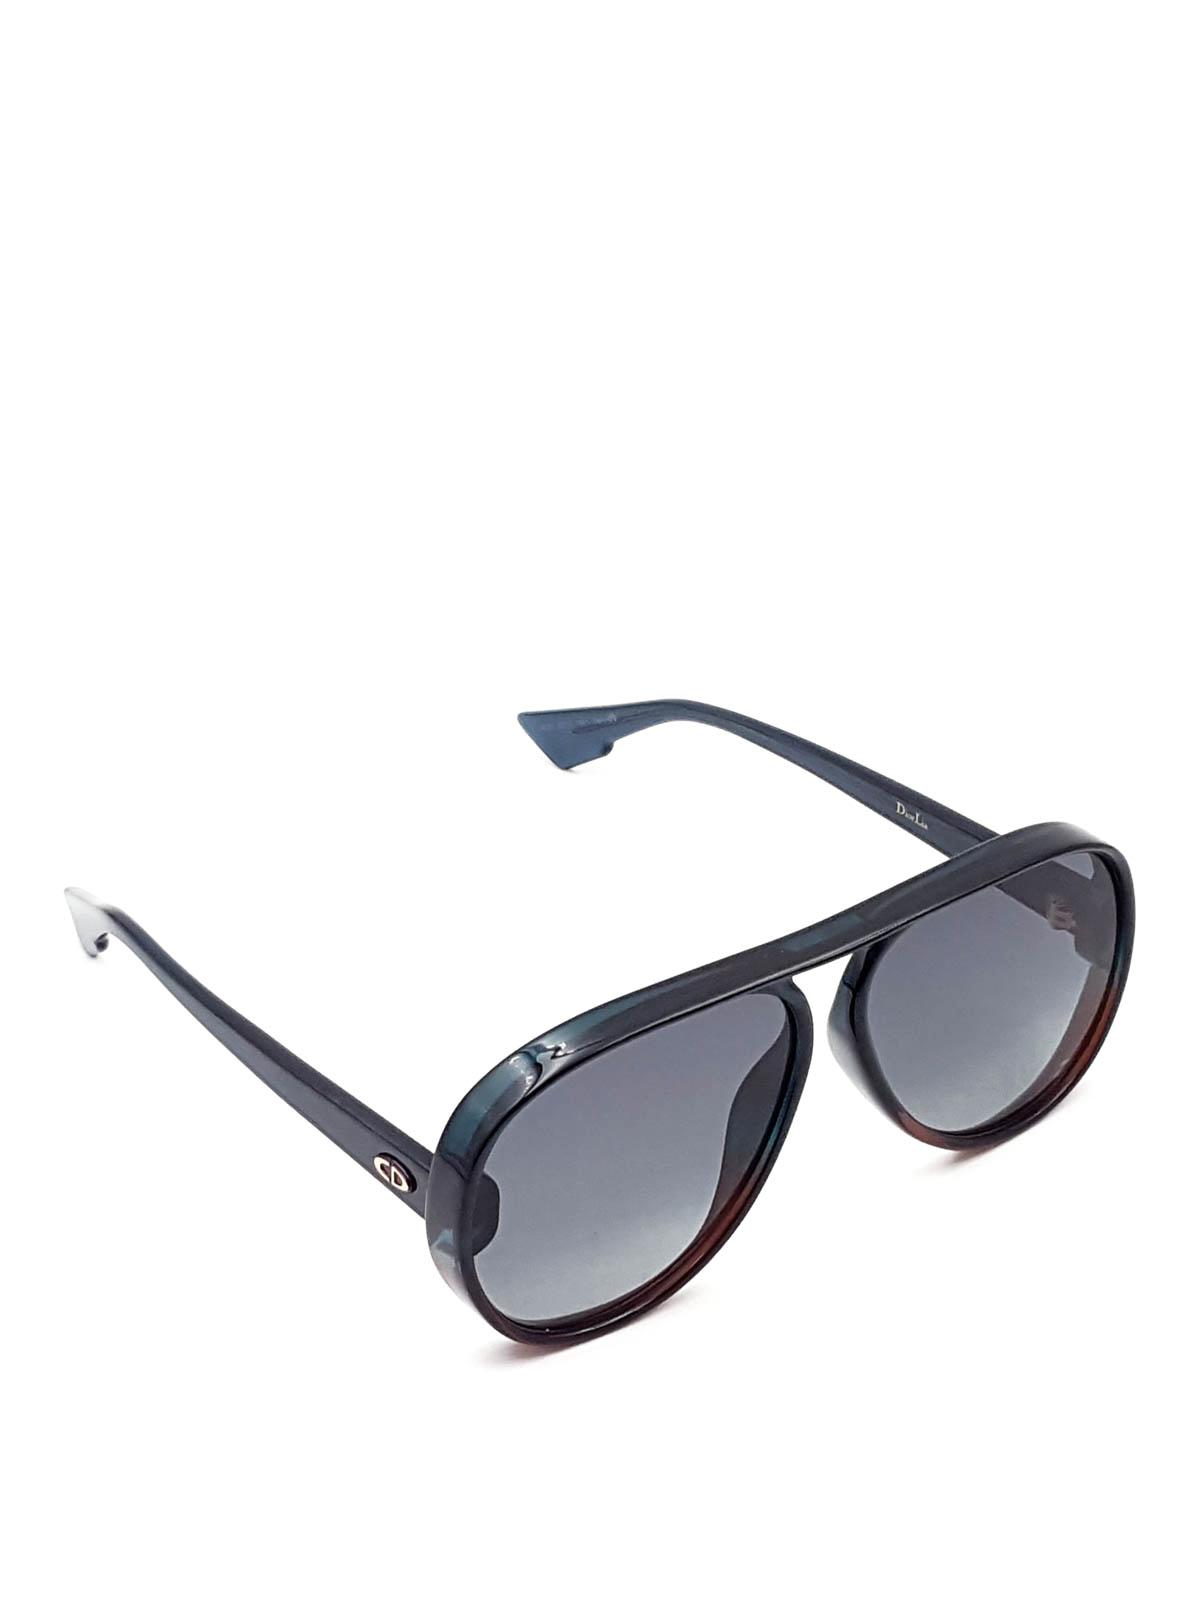 4b10c42de53 Dior - Lia sunglasses - sunglasses - DIORLIAJWJ